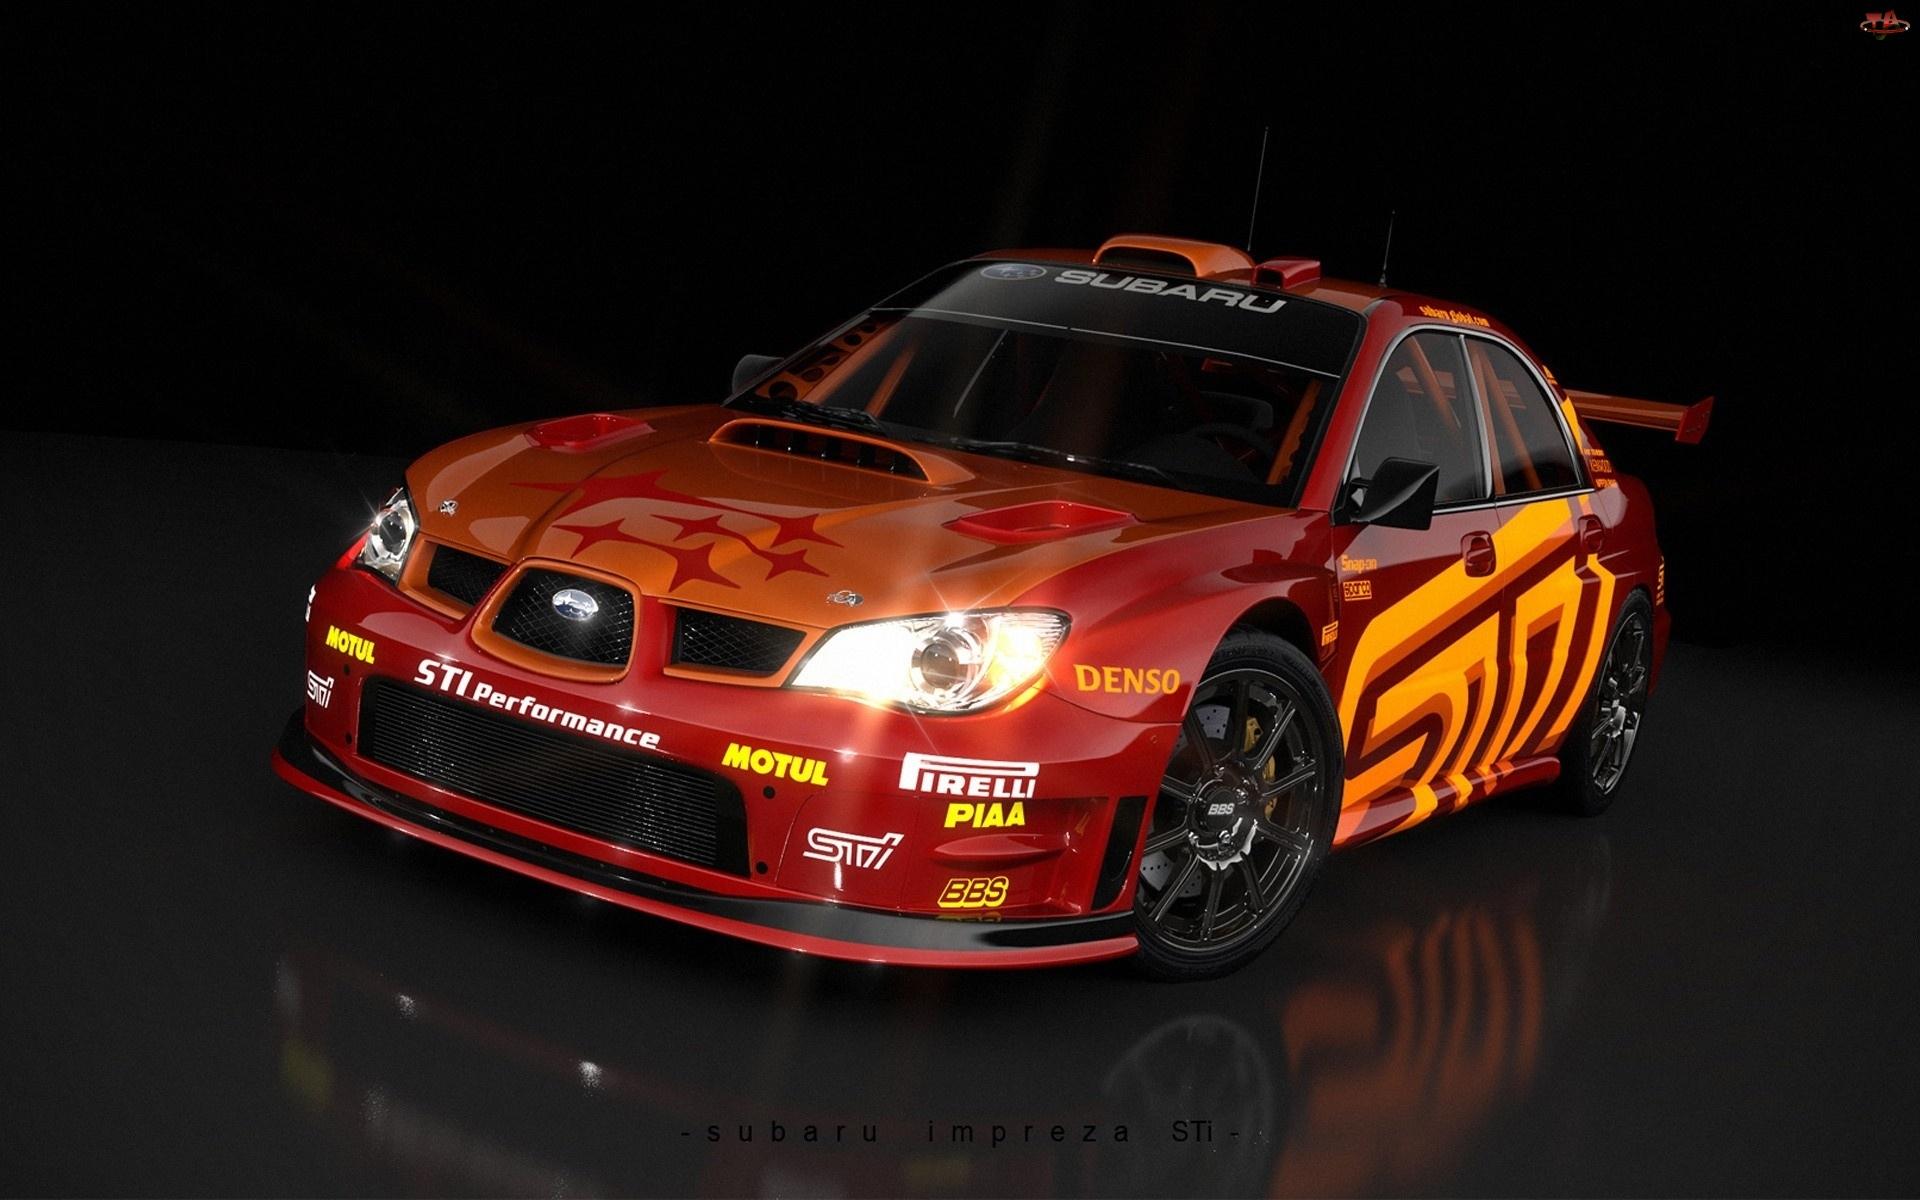 Subaru, STI, Impreza, WRX